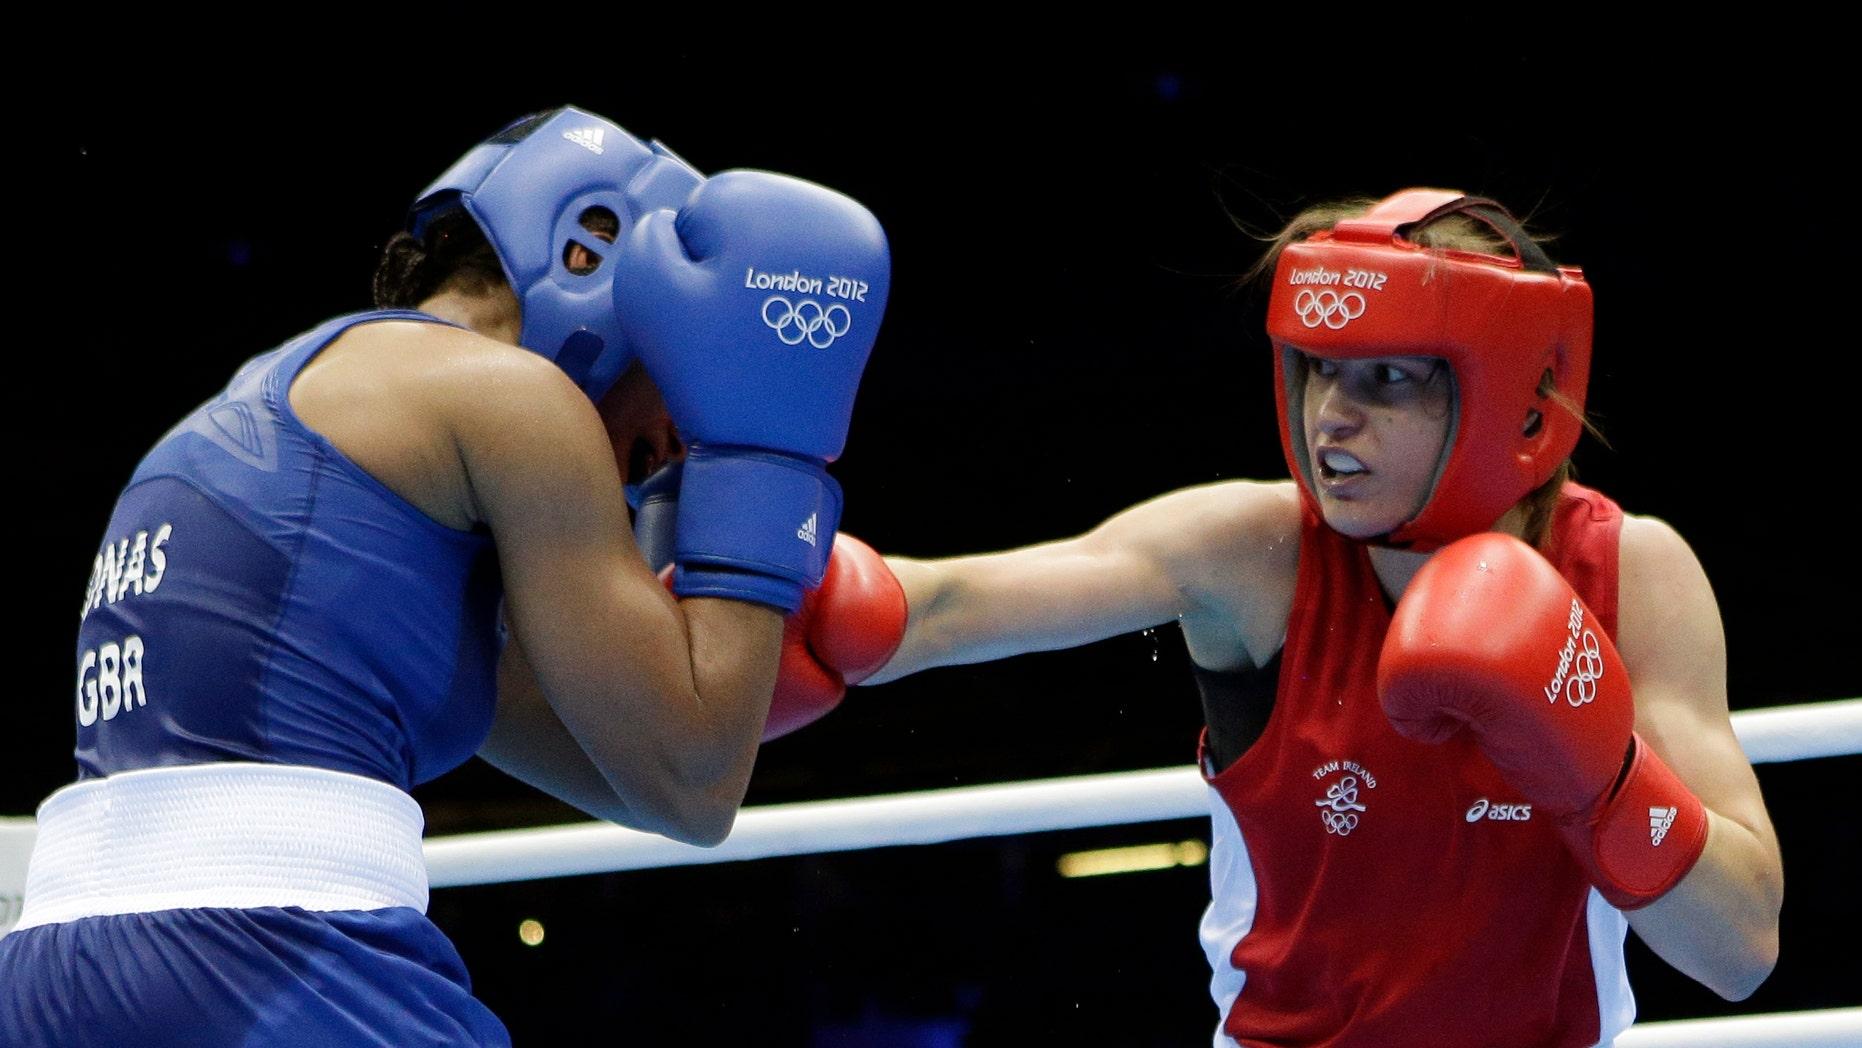 Ireland's Katie Taylor, right, fights Britain's Natasha Jonas in a women's lightweight 60-kg quarterfinal boxing match at the 2012 Summer Olympics, Monday, Aug. 6, 2012, in London. (AP Photo/Patrick Semansky)